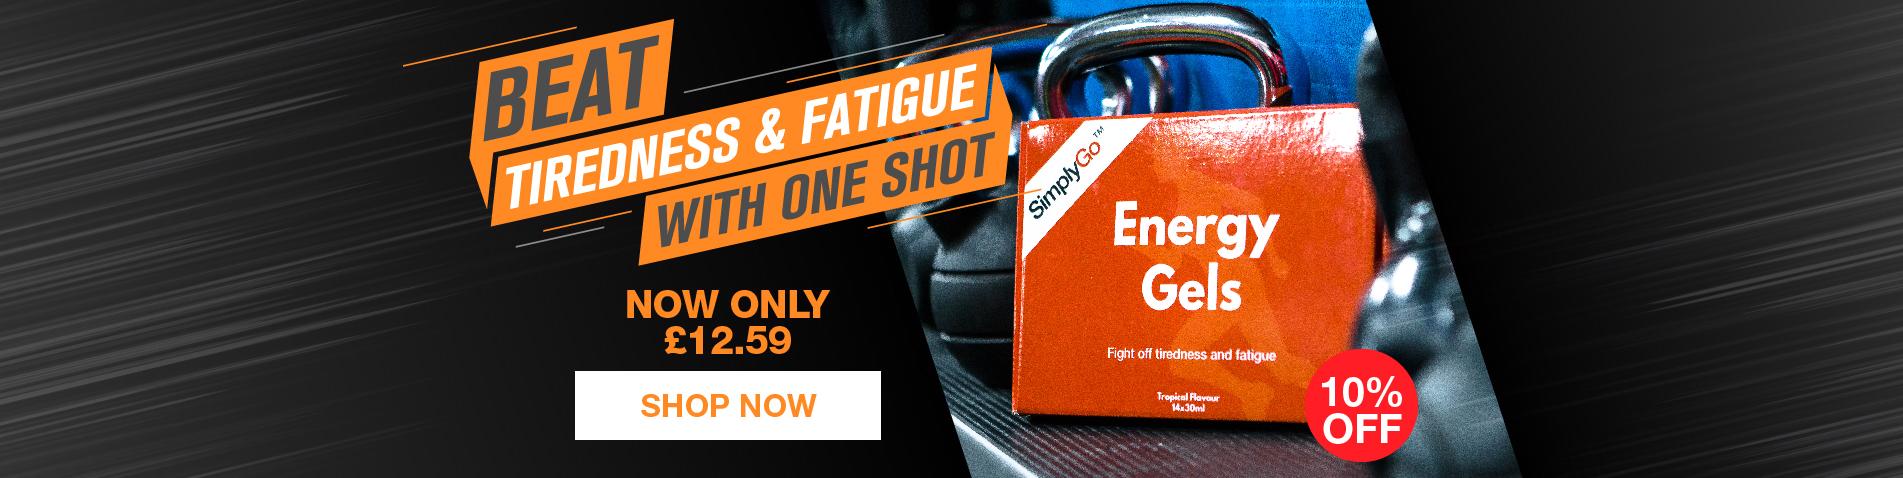 SimplyGo Energy Gels